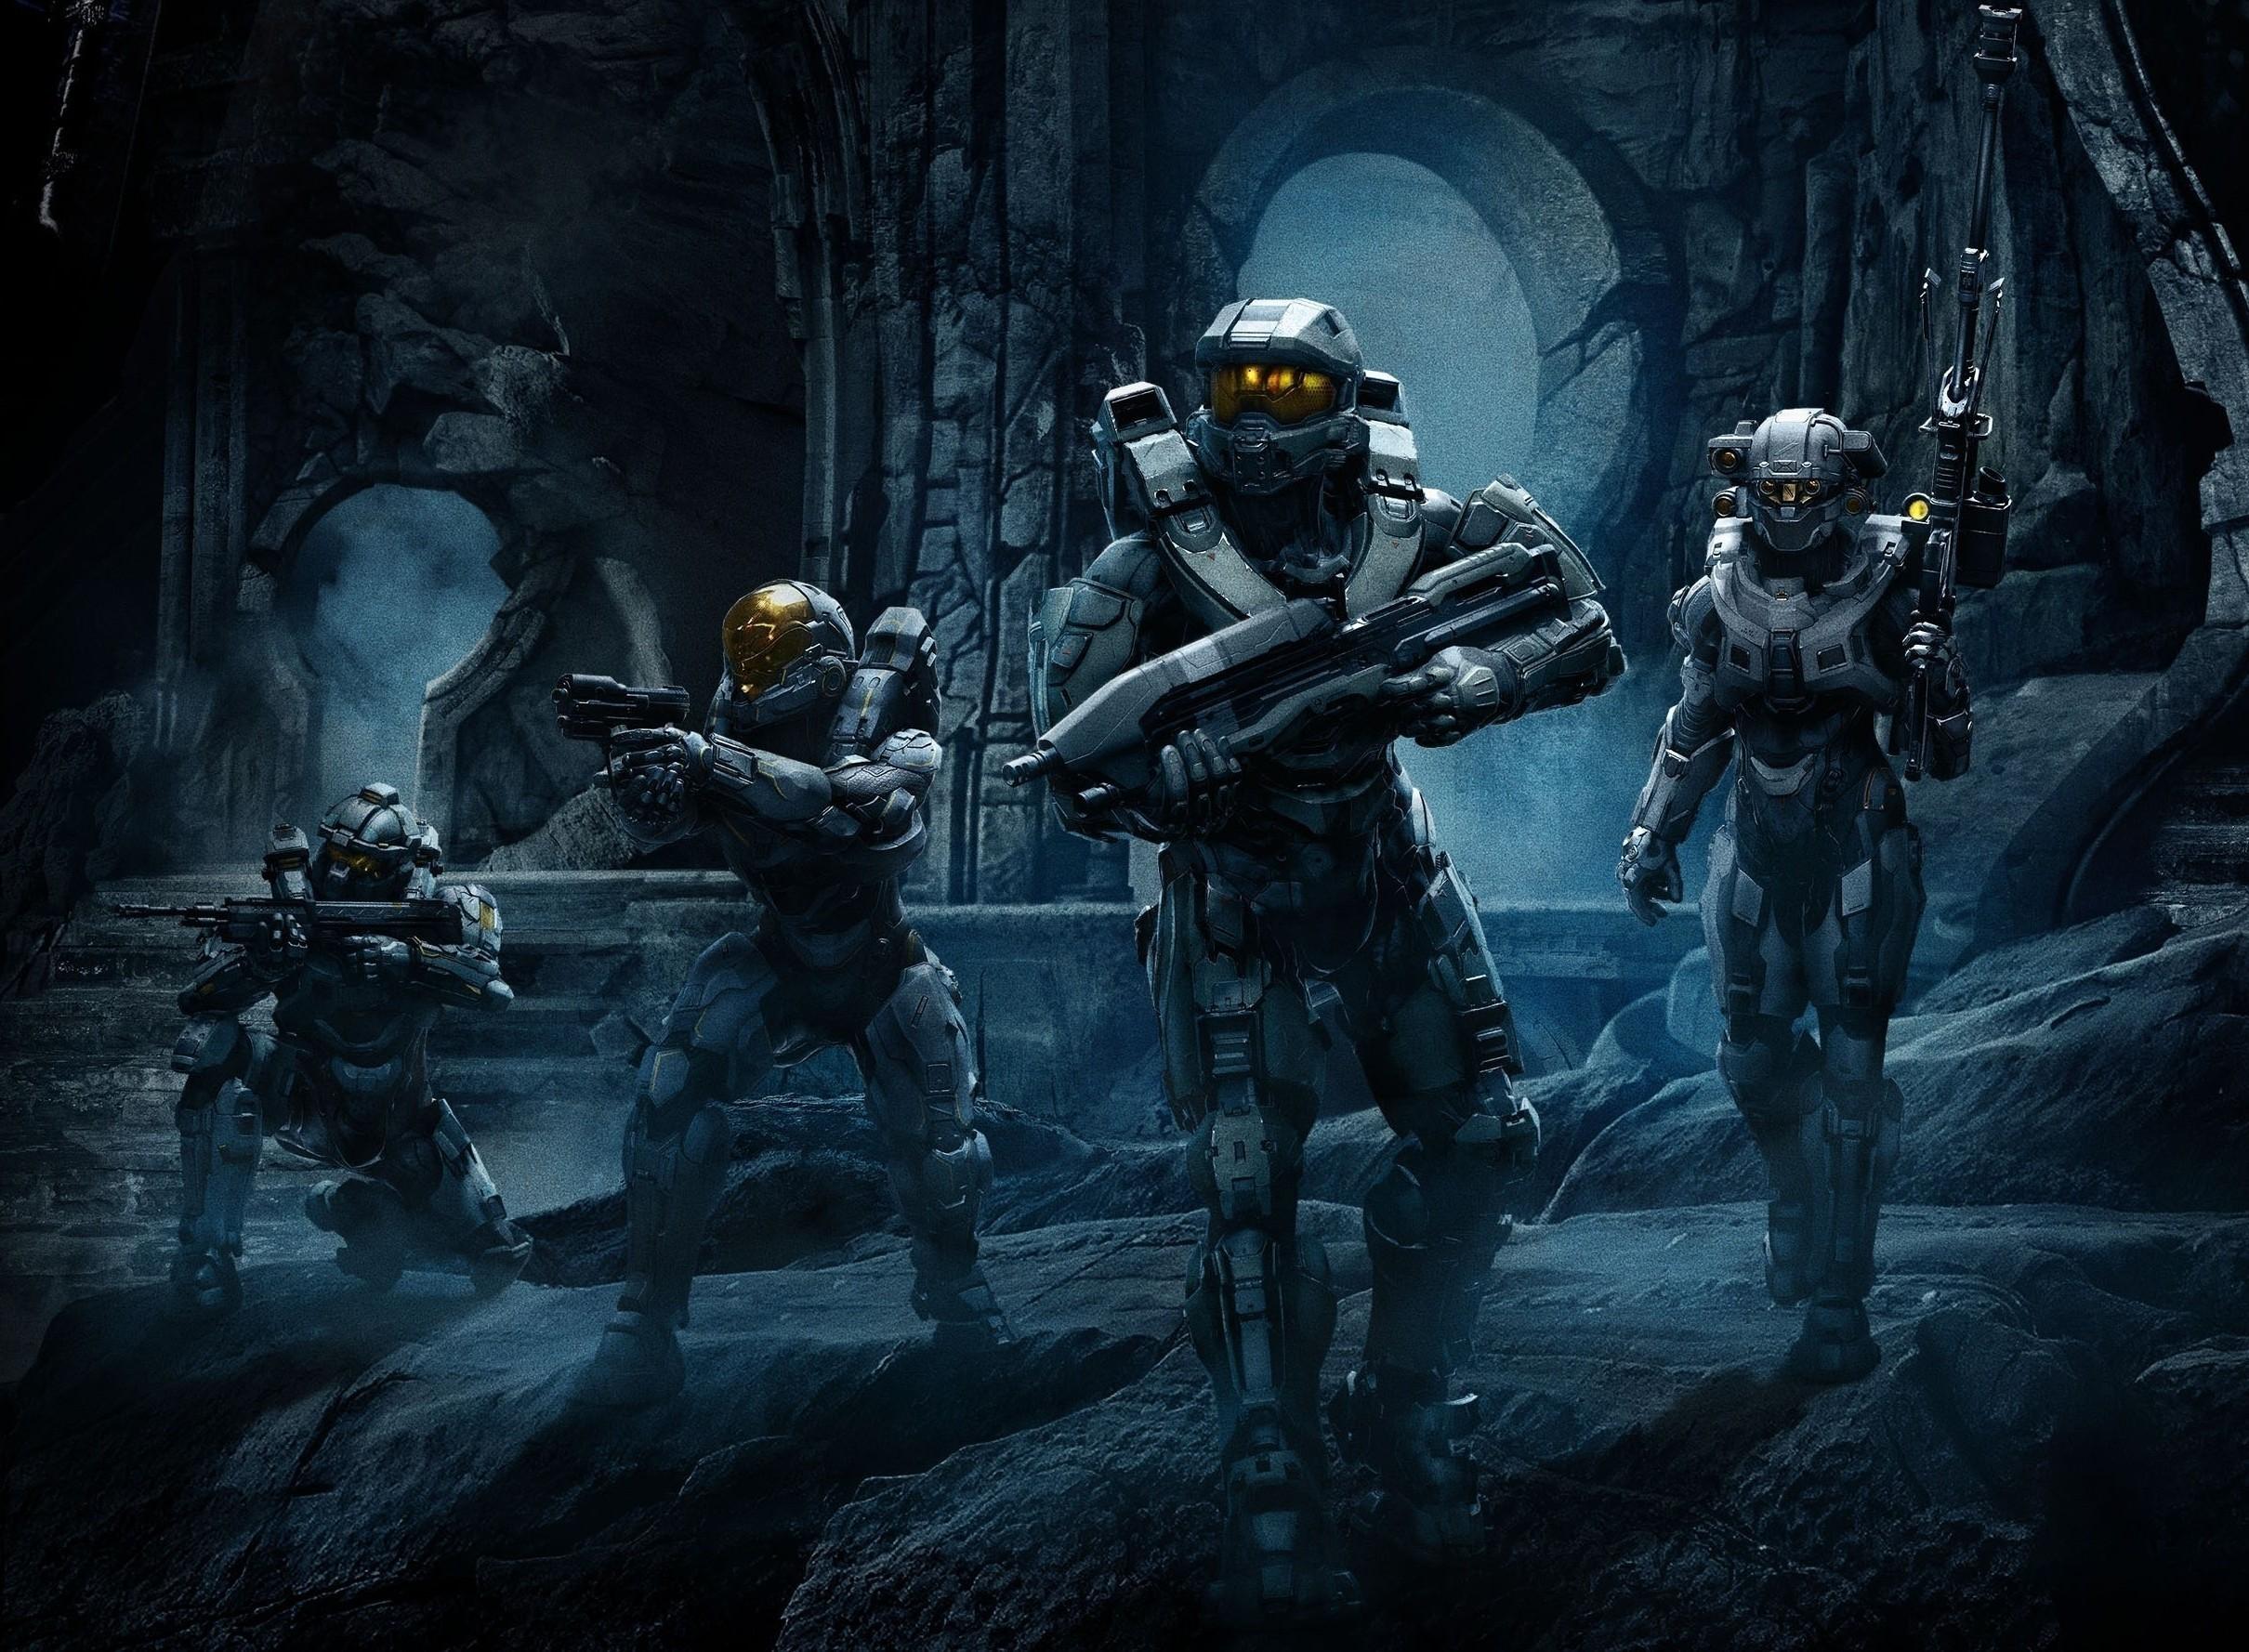 Halo 5 Blue Team Wallpaper 76 Images